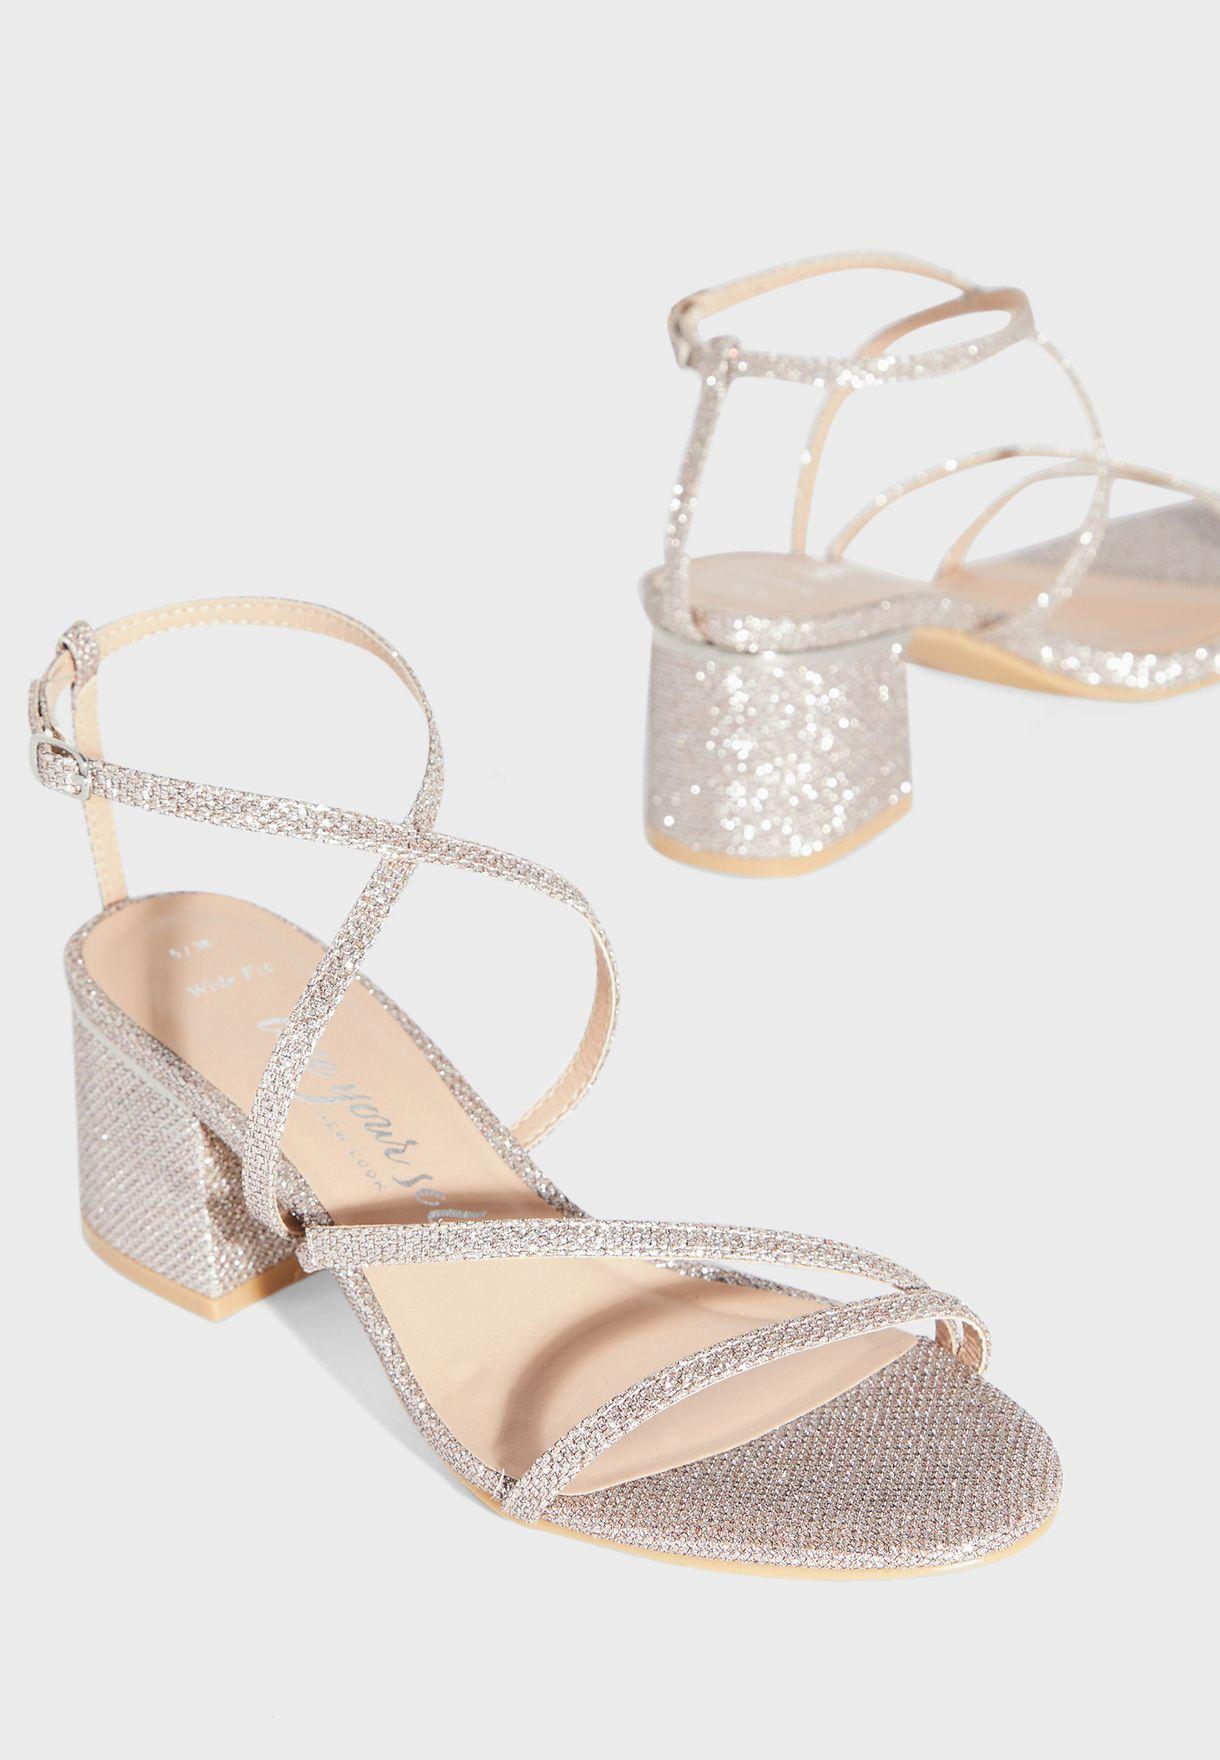 Tiamo Wide Fit Ankle Strap Buckle Detail Sandal